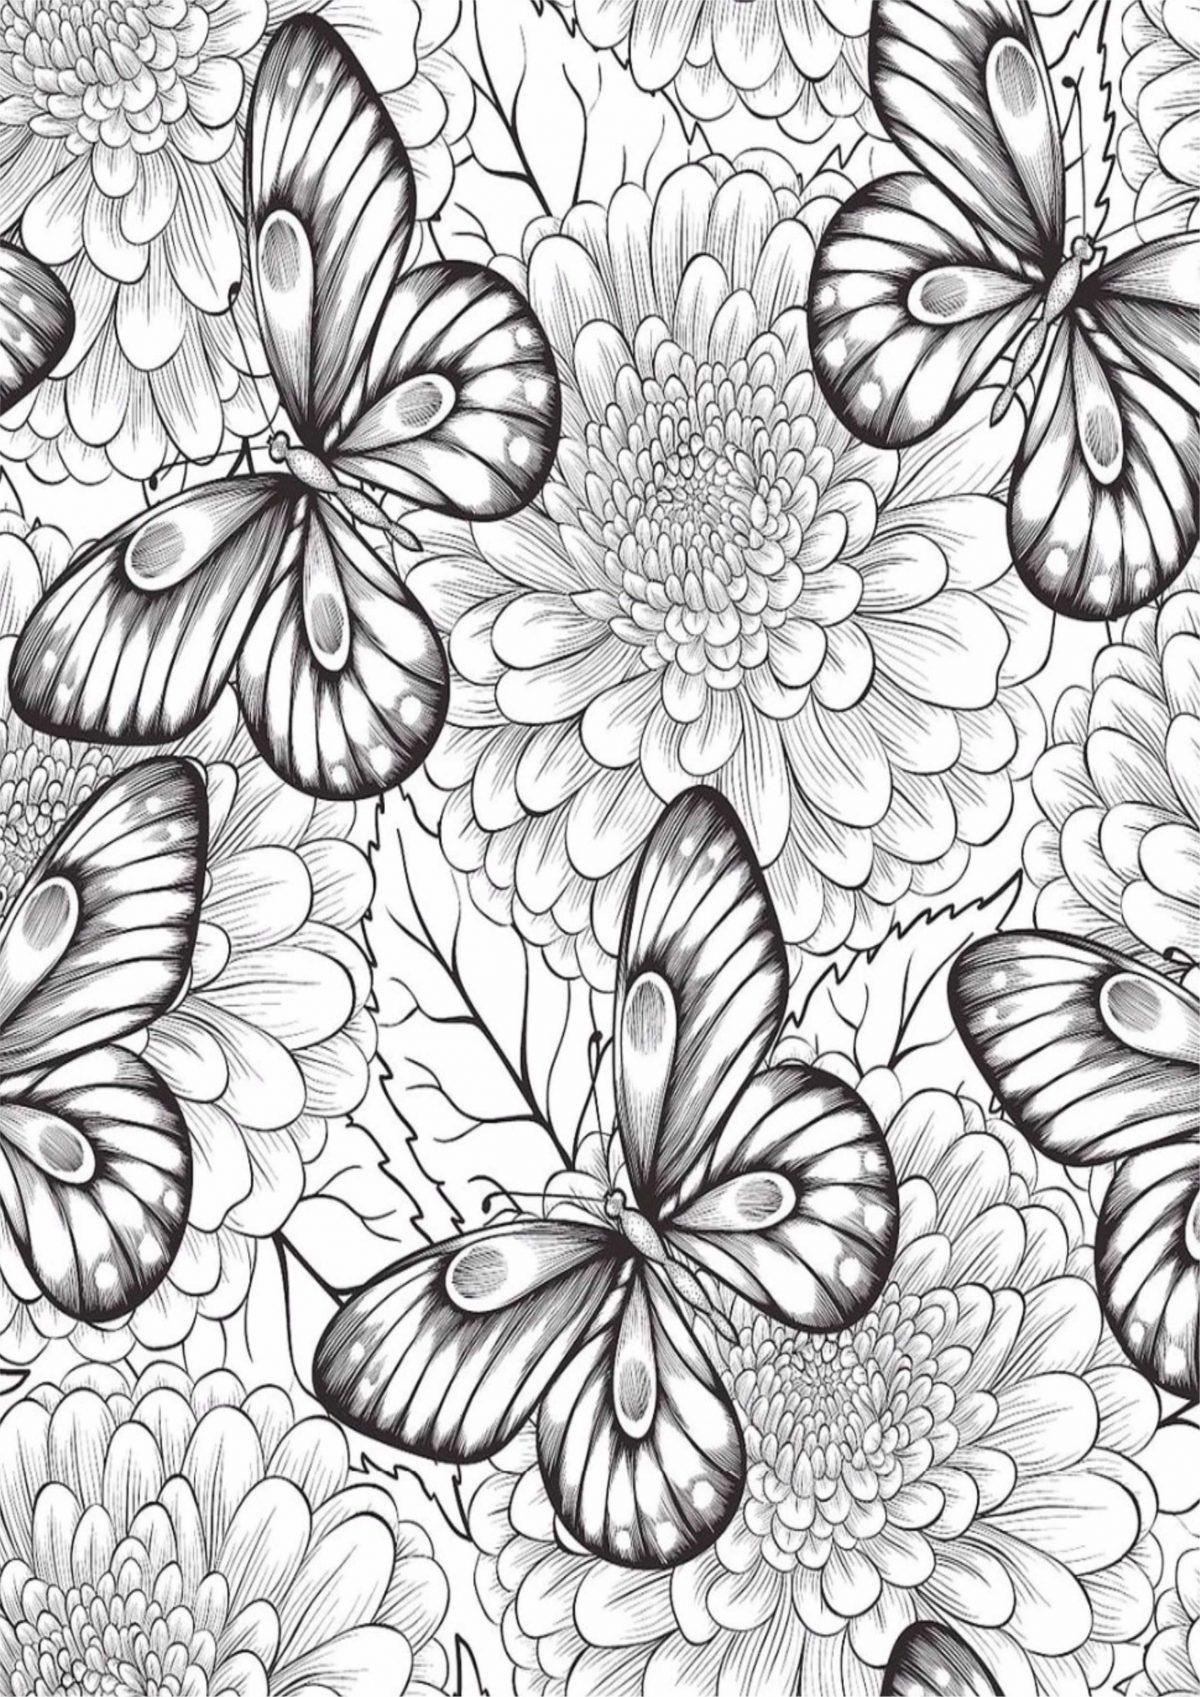 Раскраска с бабочками